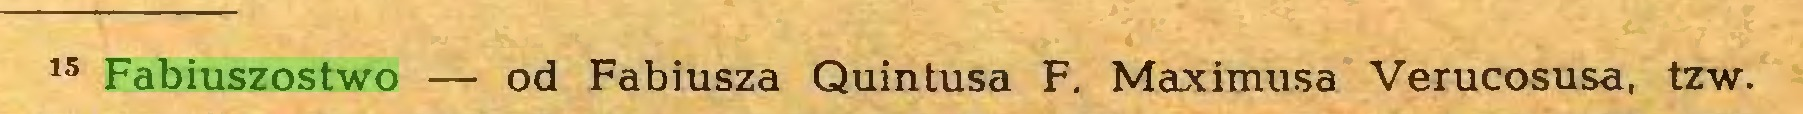 (...) 15 Fabiuszostwo — od Fabiusza Quintusa F. Maximusa Verucosusa, tzw...